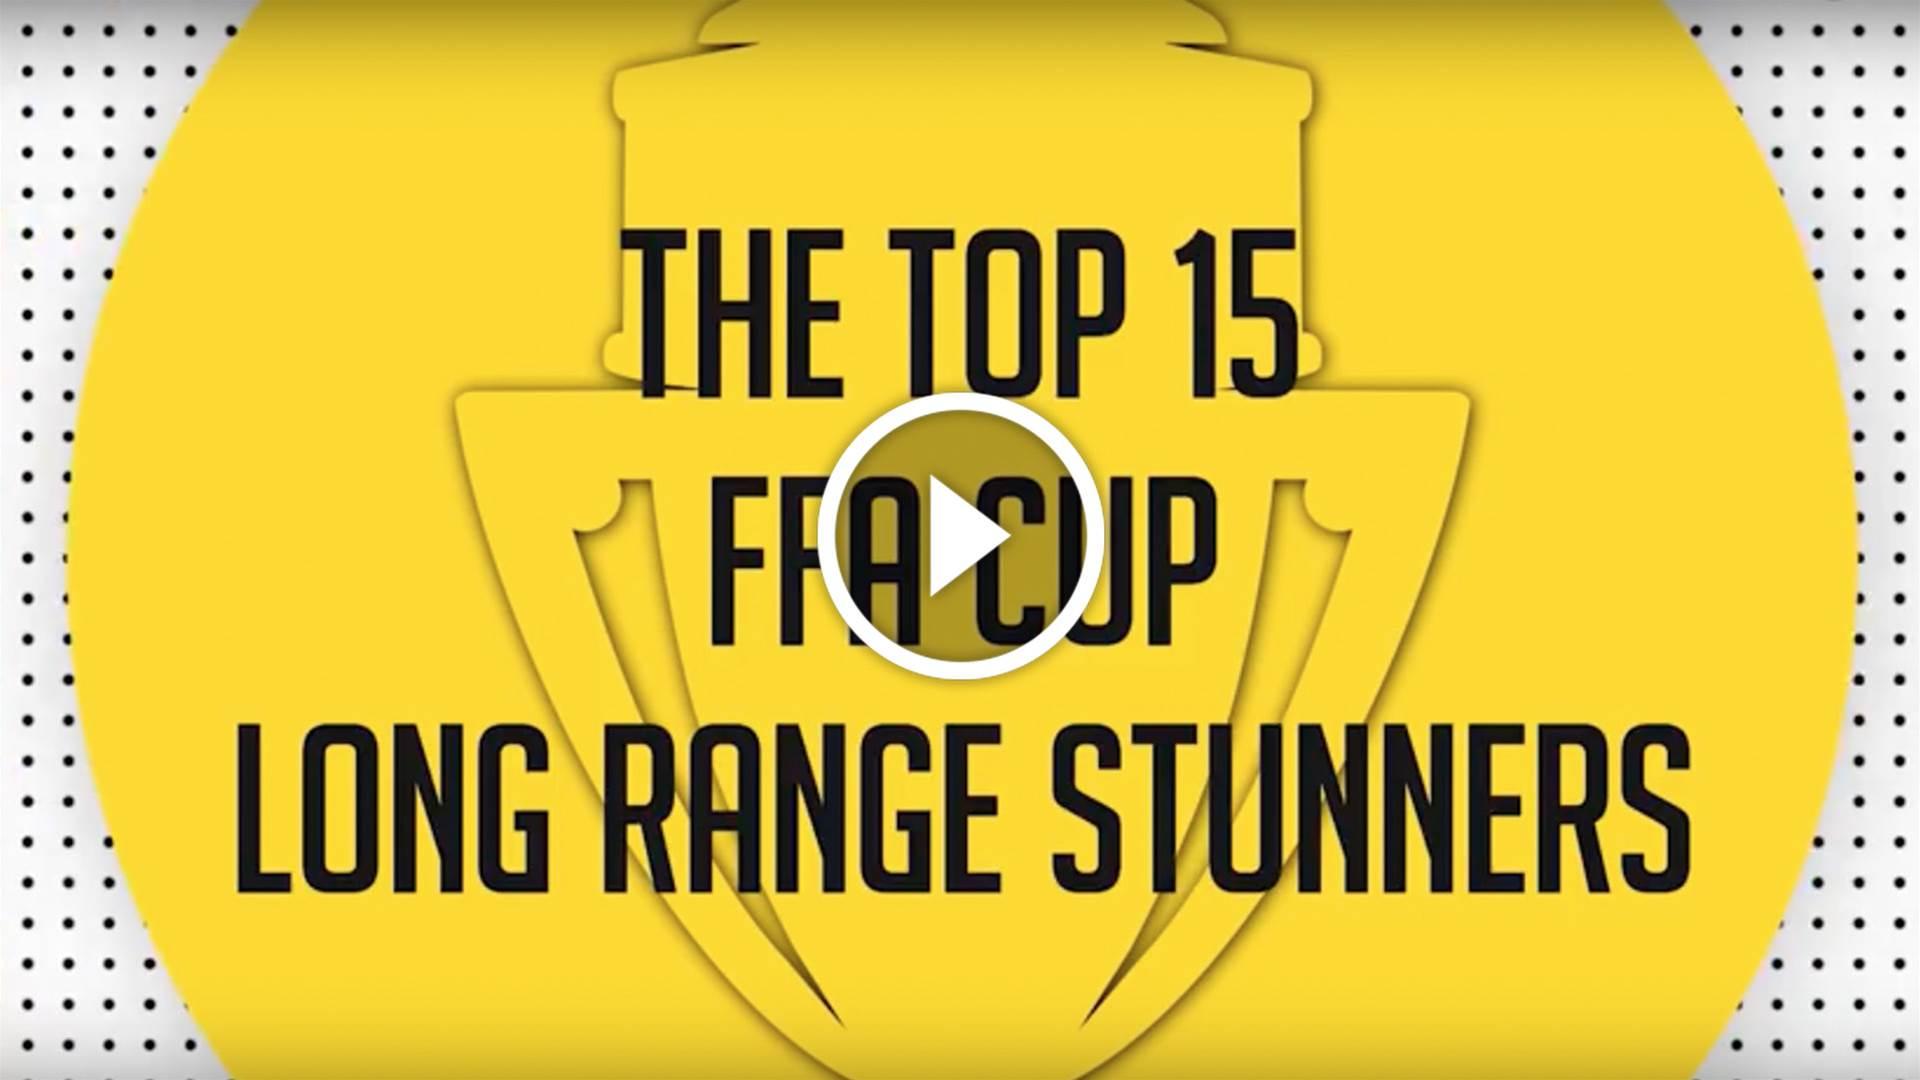 Top 15 FFA Cup long-range screamers